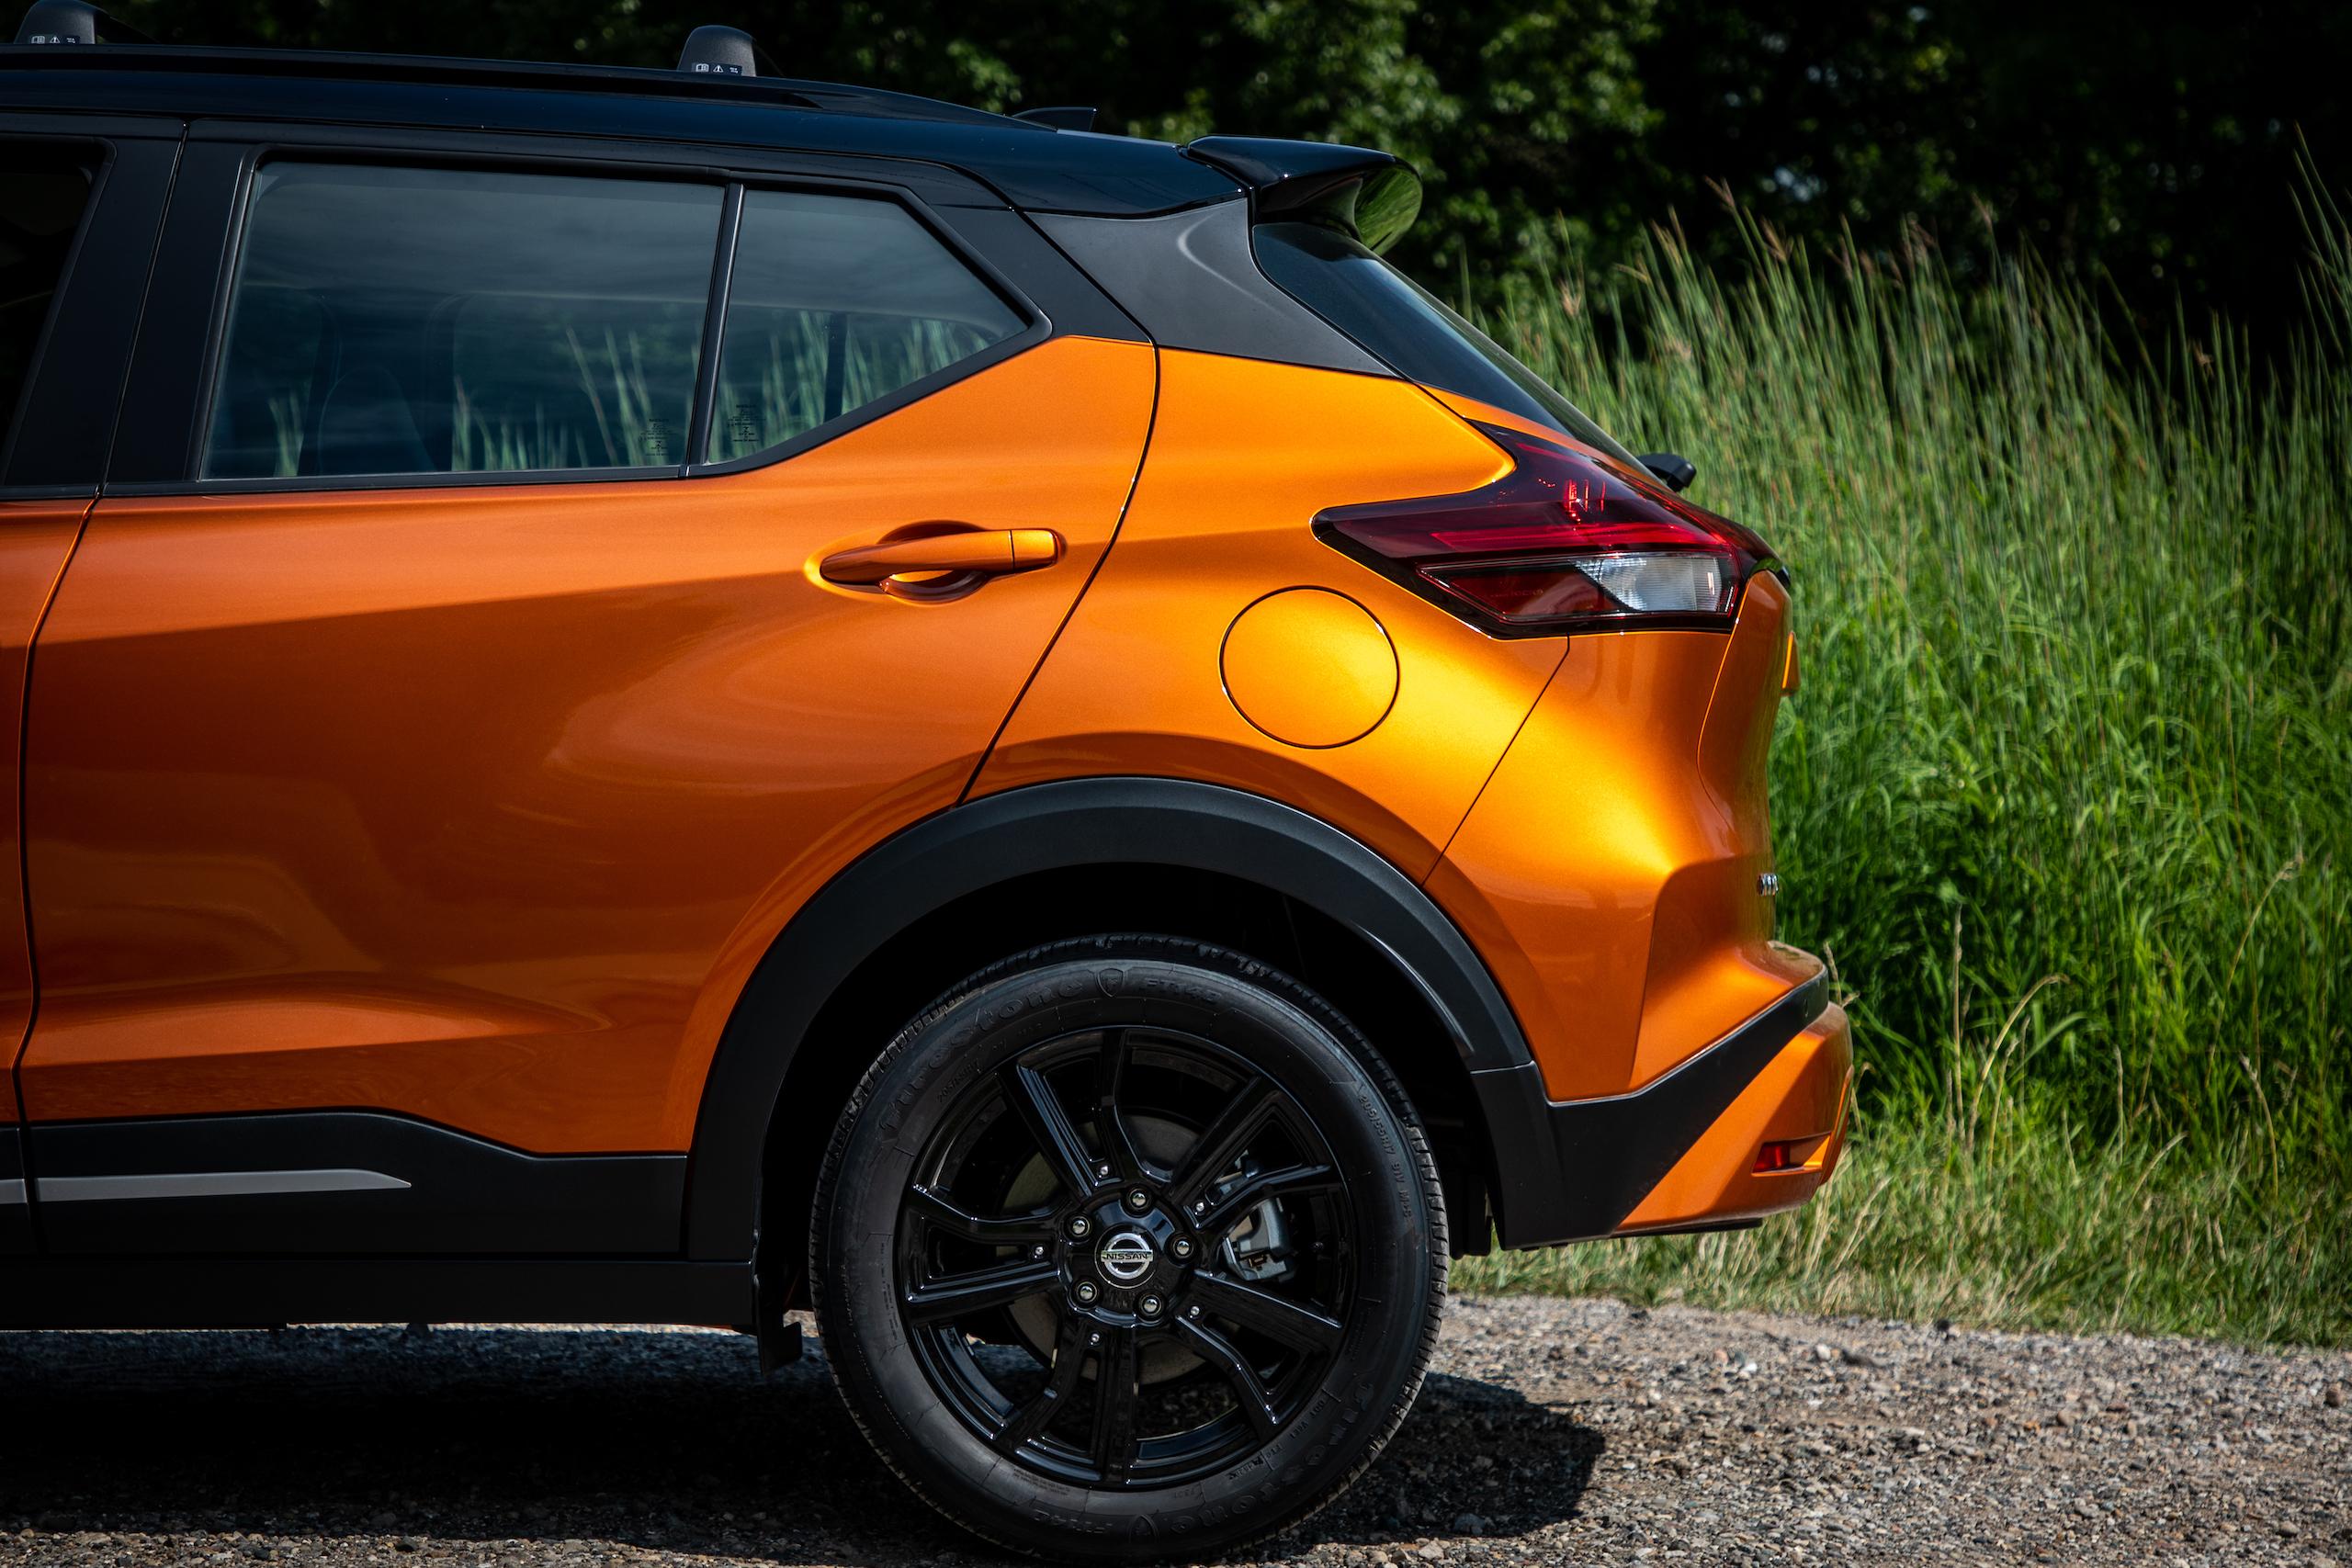 Nissan Kicks rear half side profile